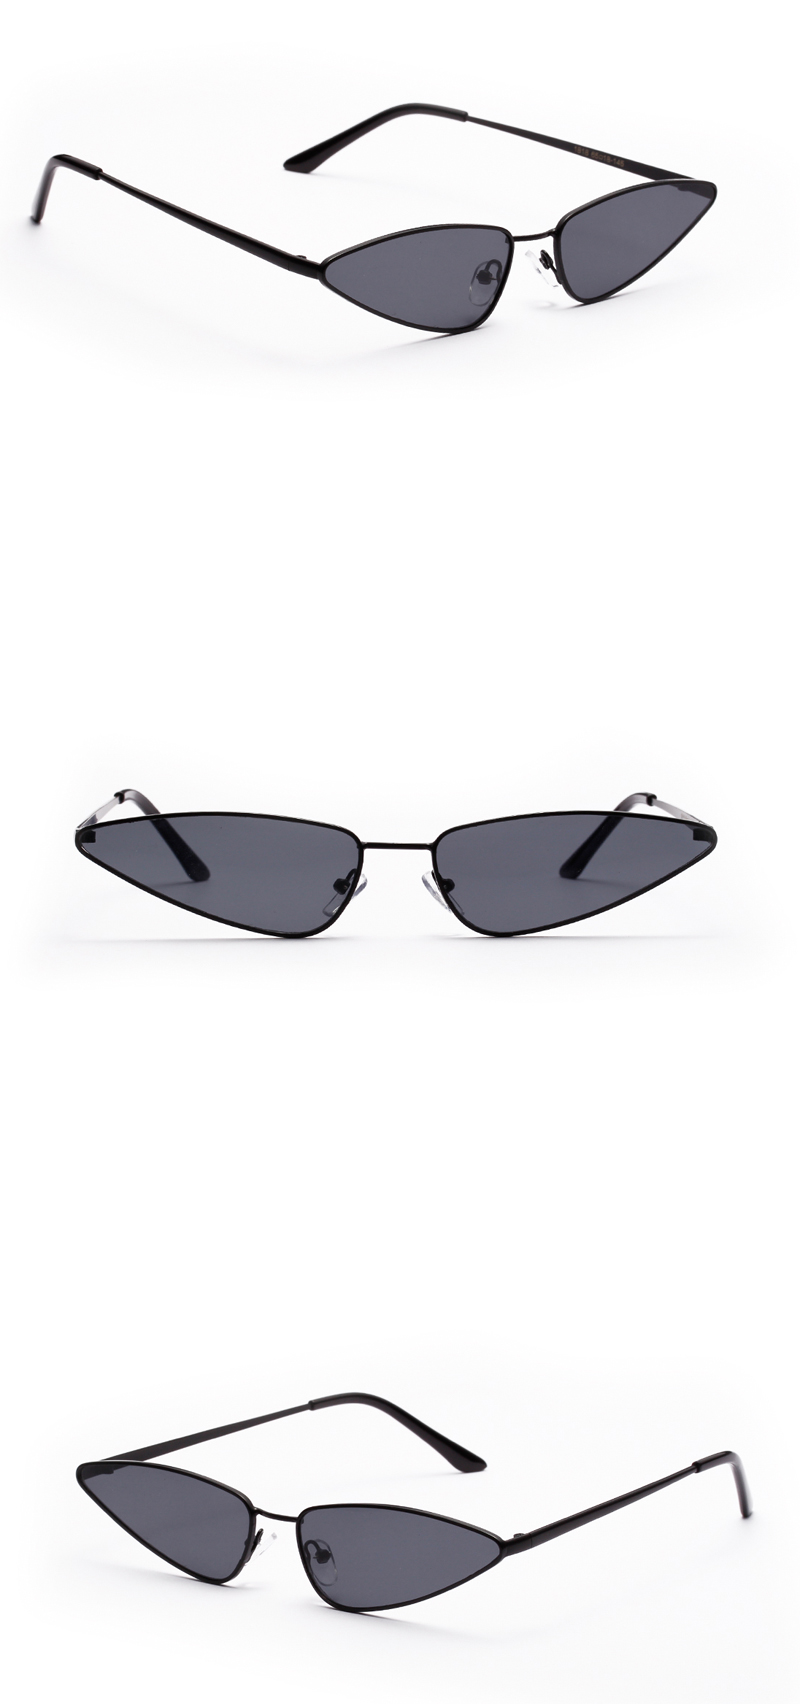 cat eye sunglasses 2005 details (8)